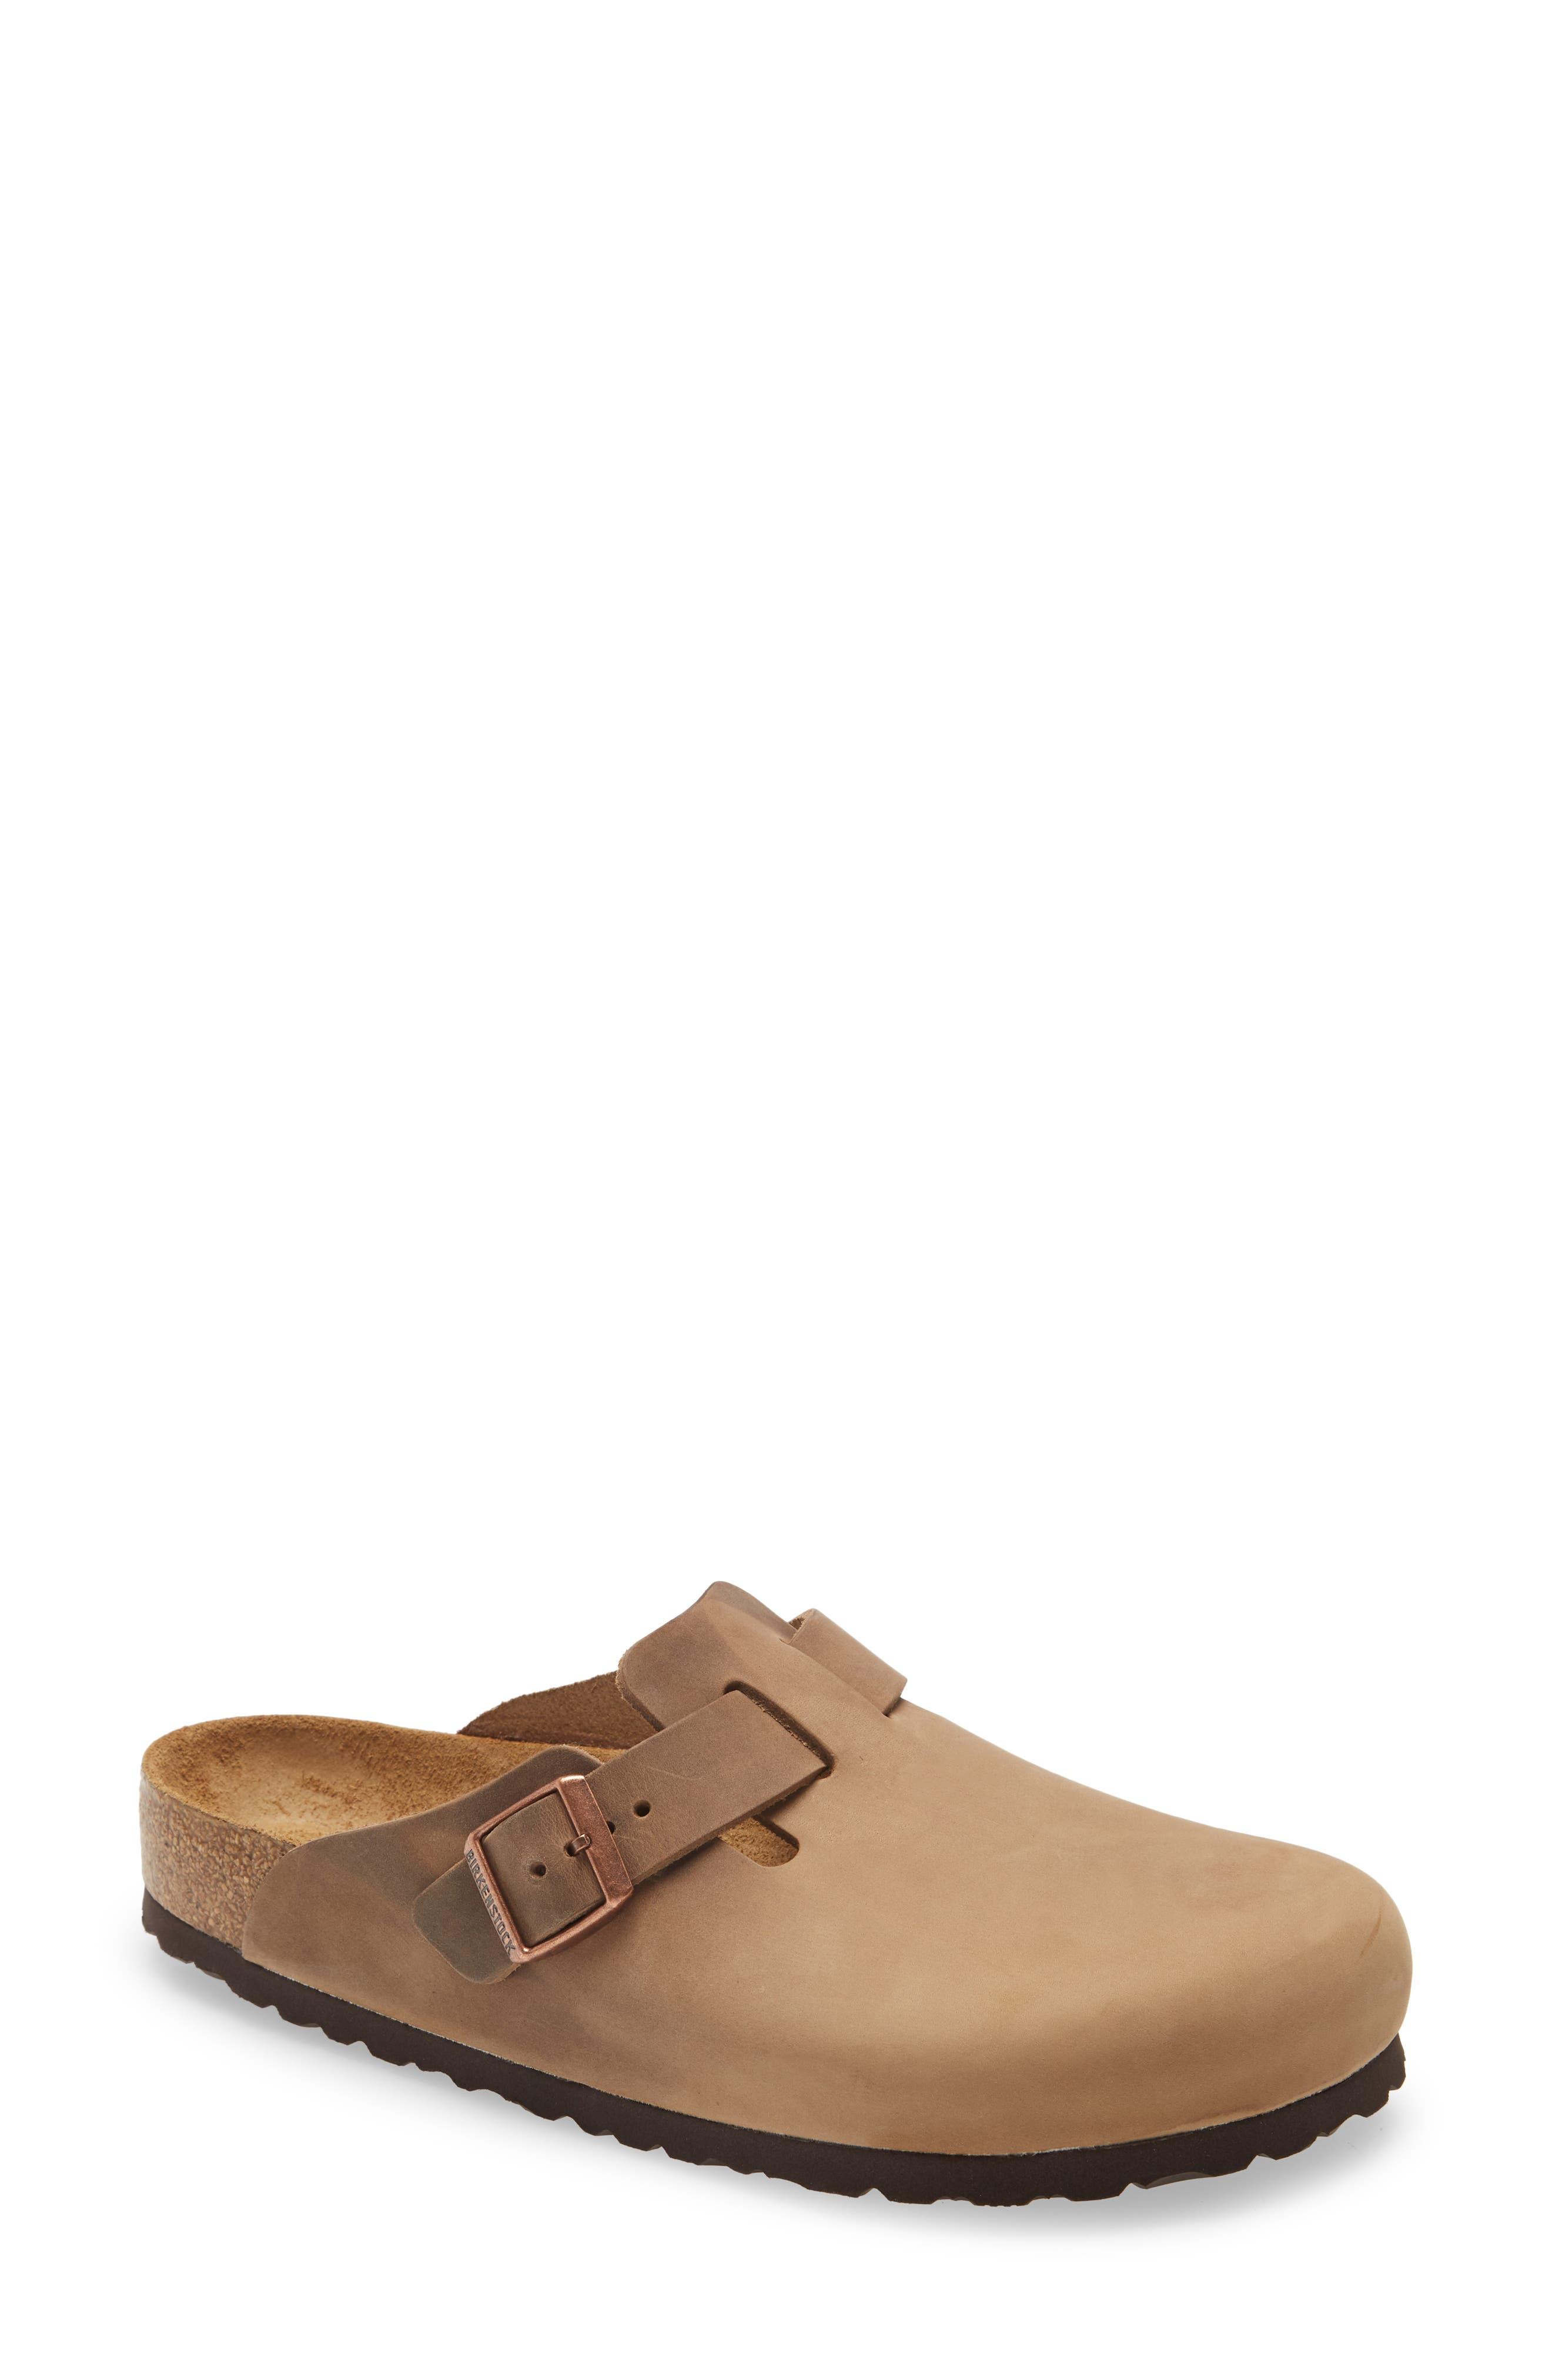 Men's Loafers \u0026 Slip-Ons   Nordstrom